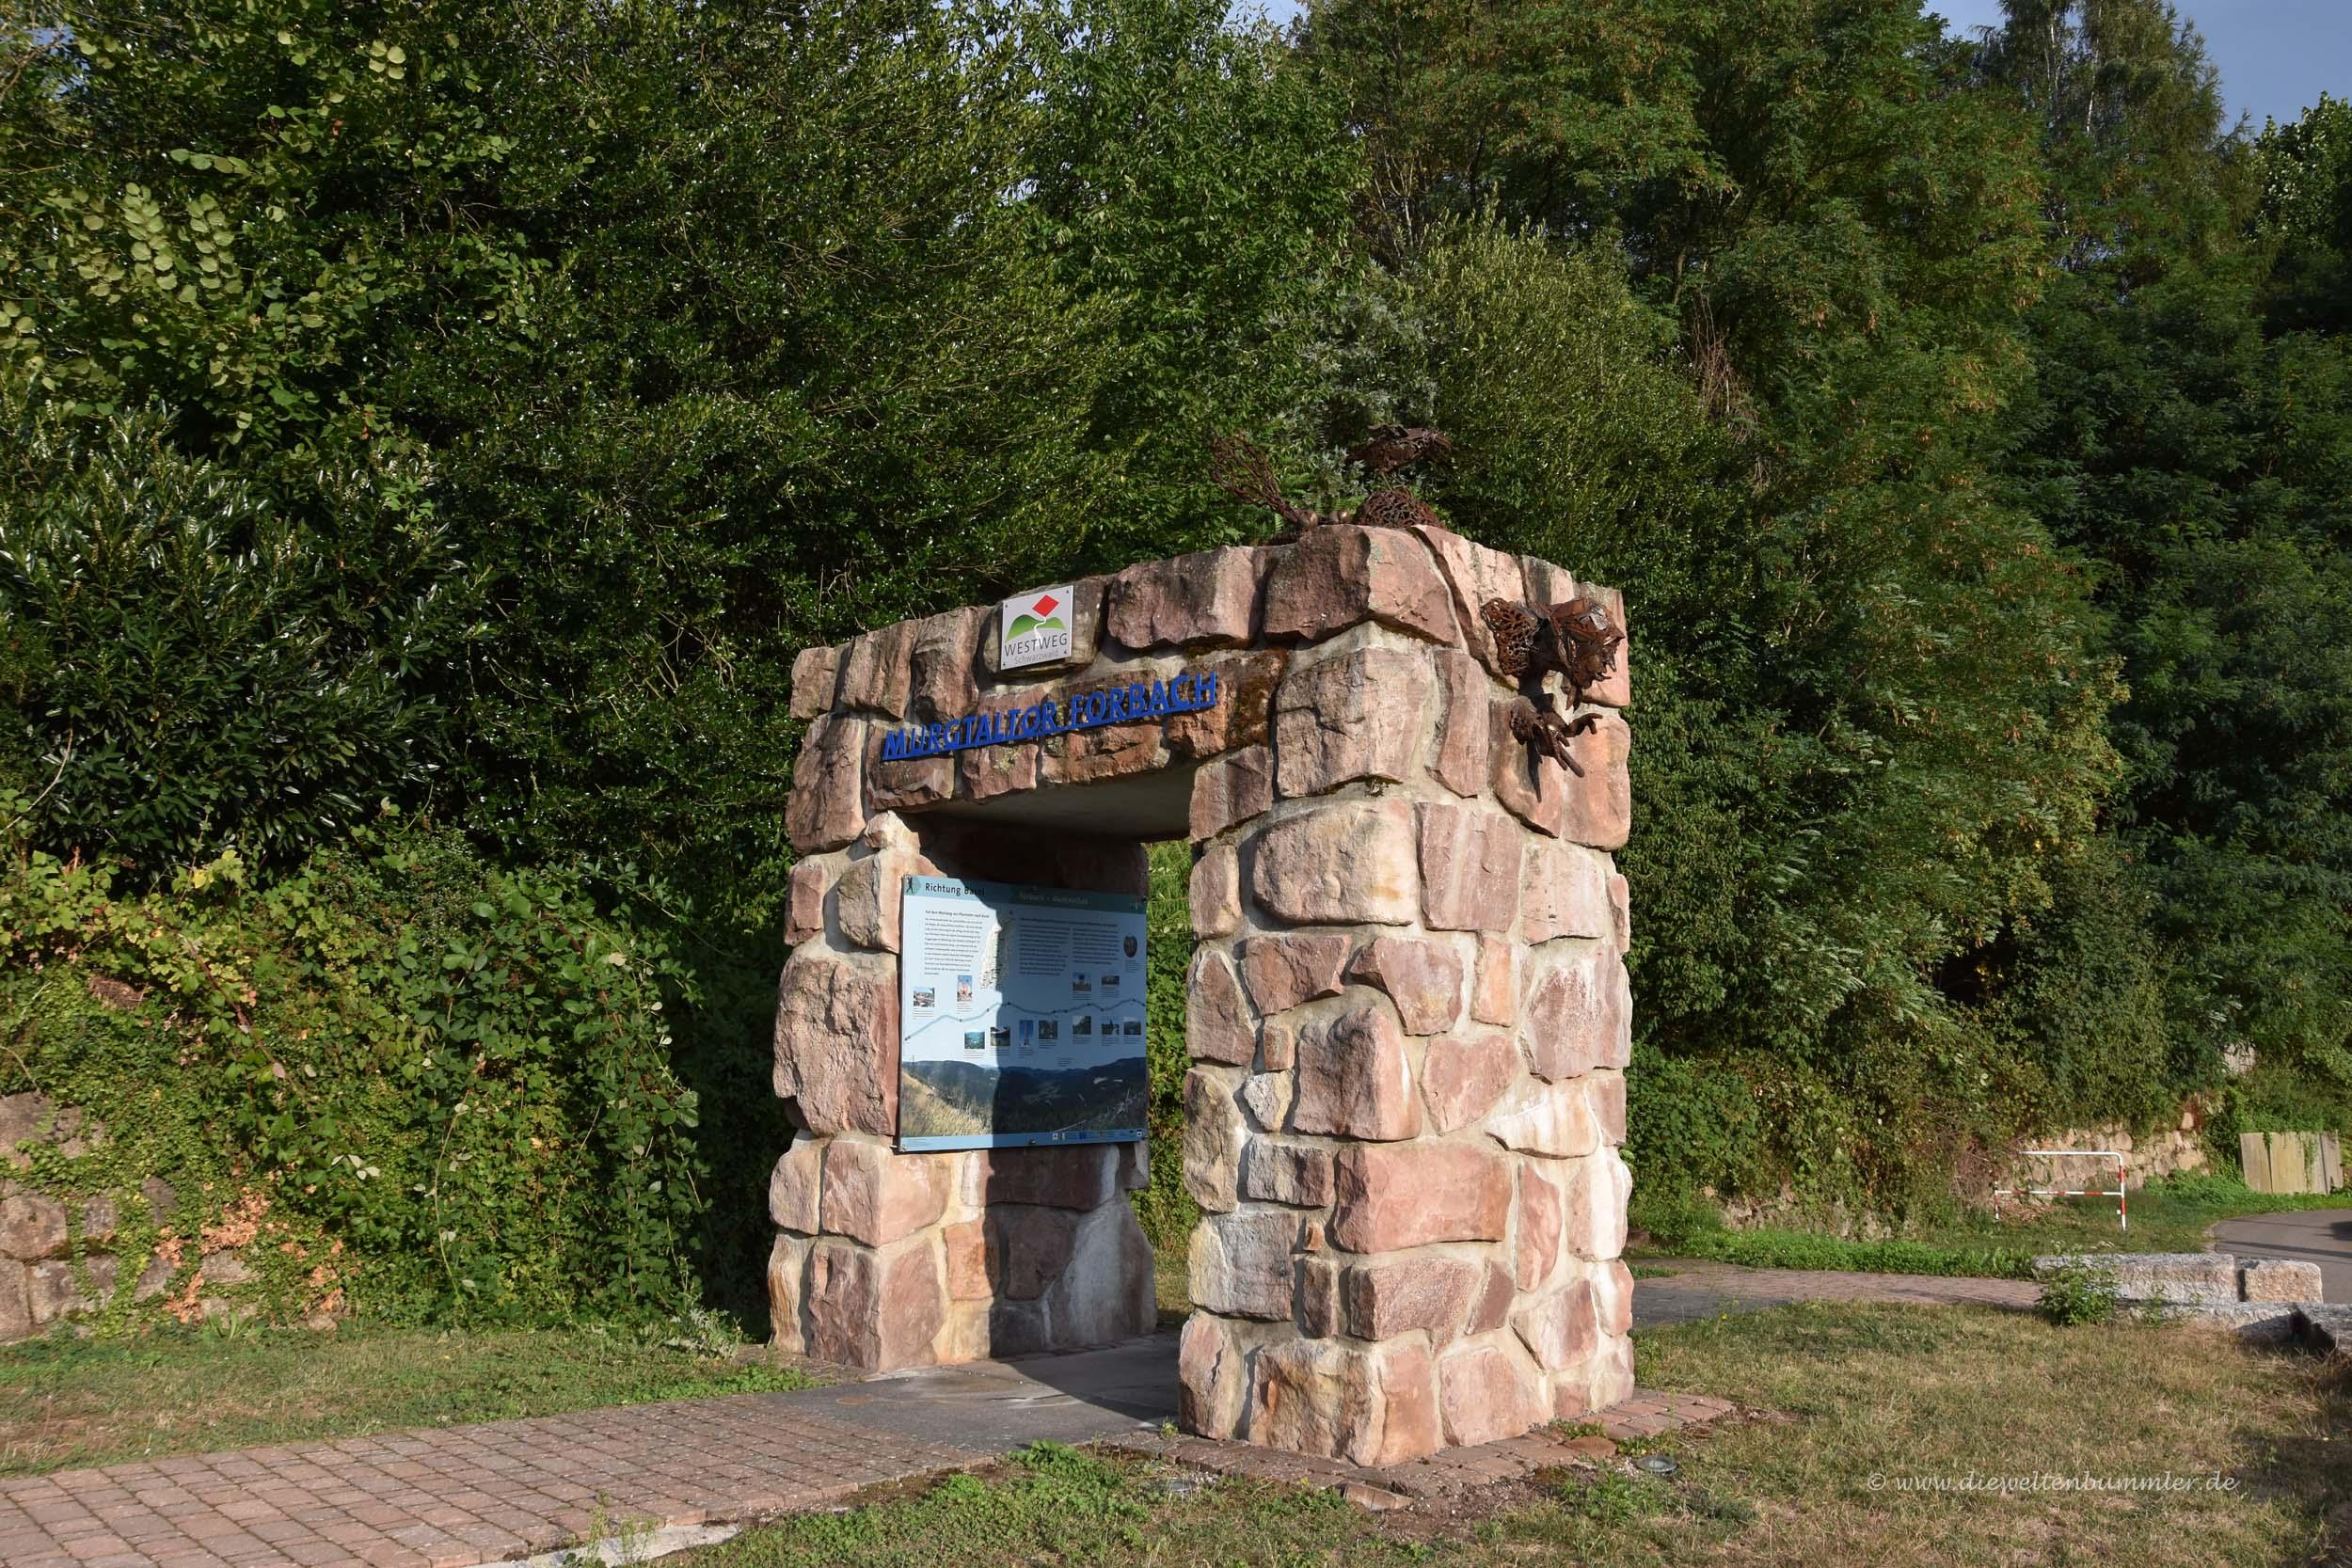 Murgtaltor in Forbach